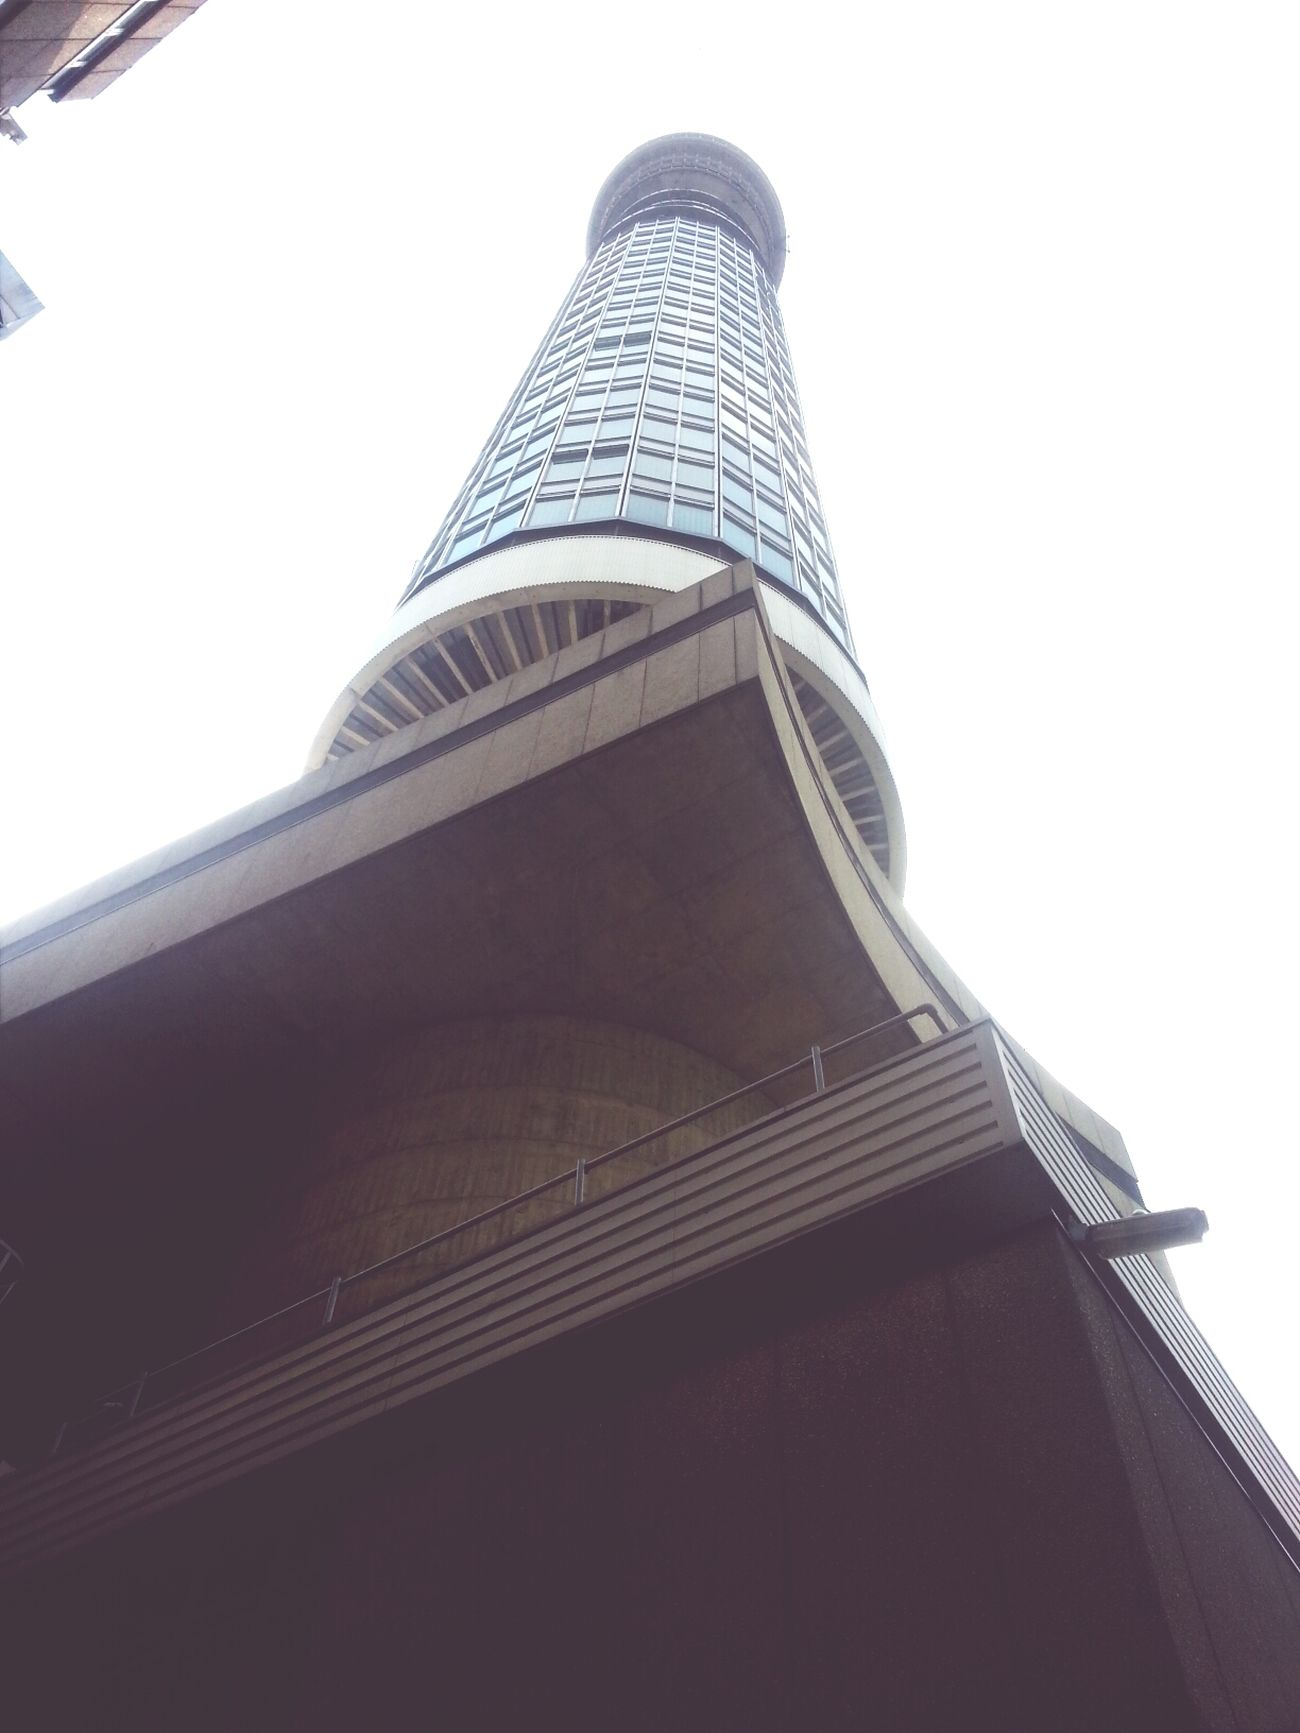 BT tower in London BT Tower London BT Tower